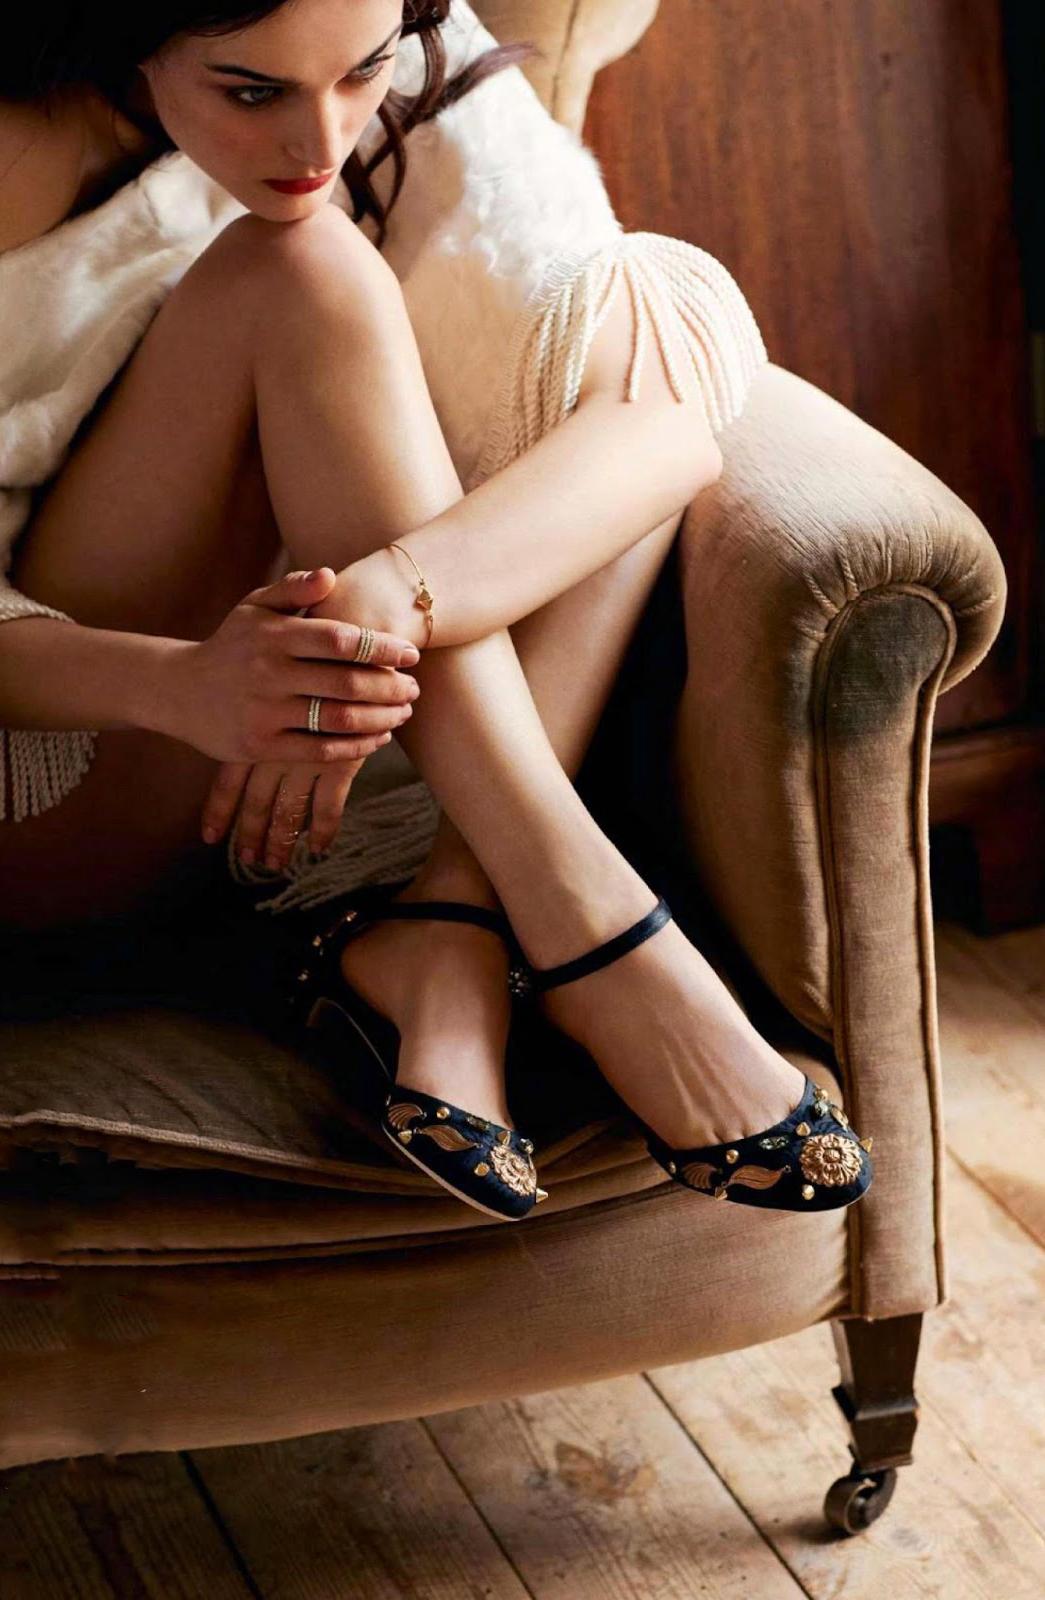 Sibui Nazarenko wearing Dolce&Gabbana shoes in La Belle Oisive / Elle France April 2015 (photography: Robert Wyatt, styling: Elissa Castelbou) via www.fashionedbylove.co.uk